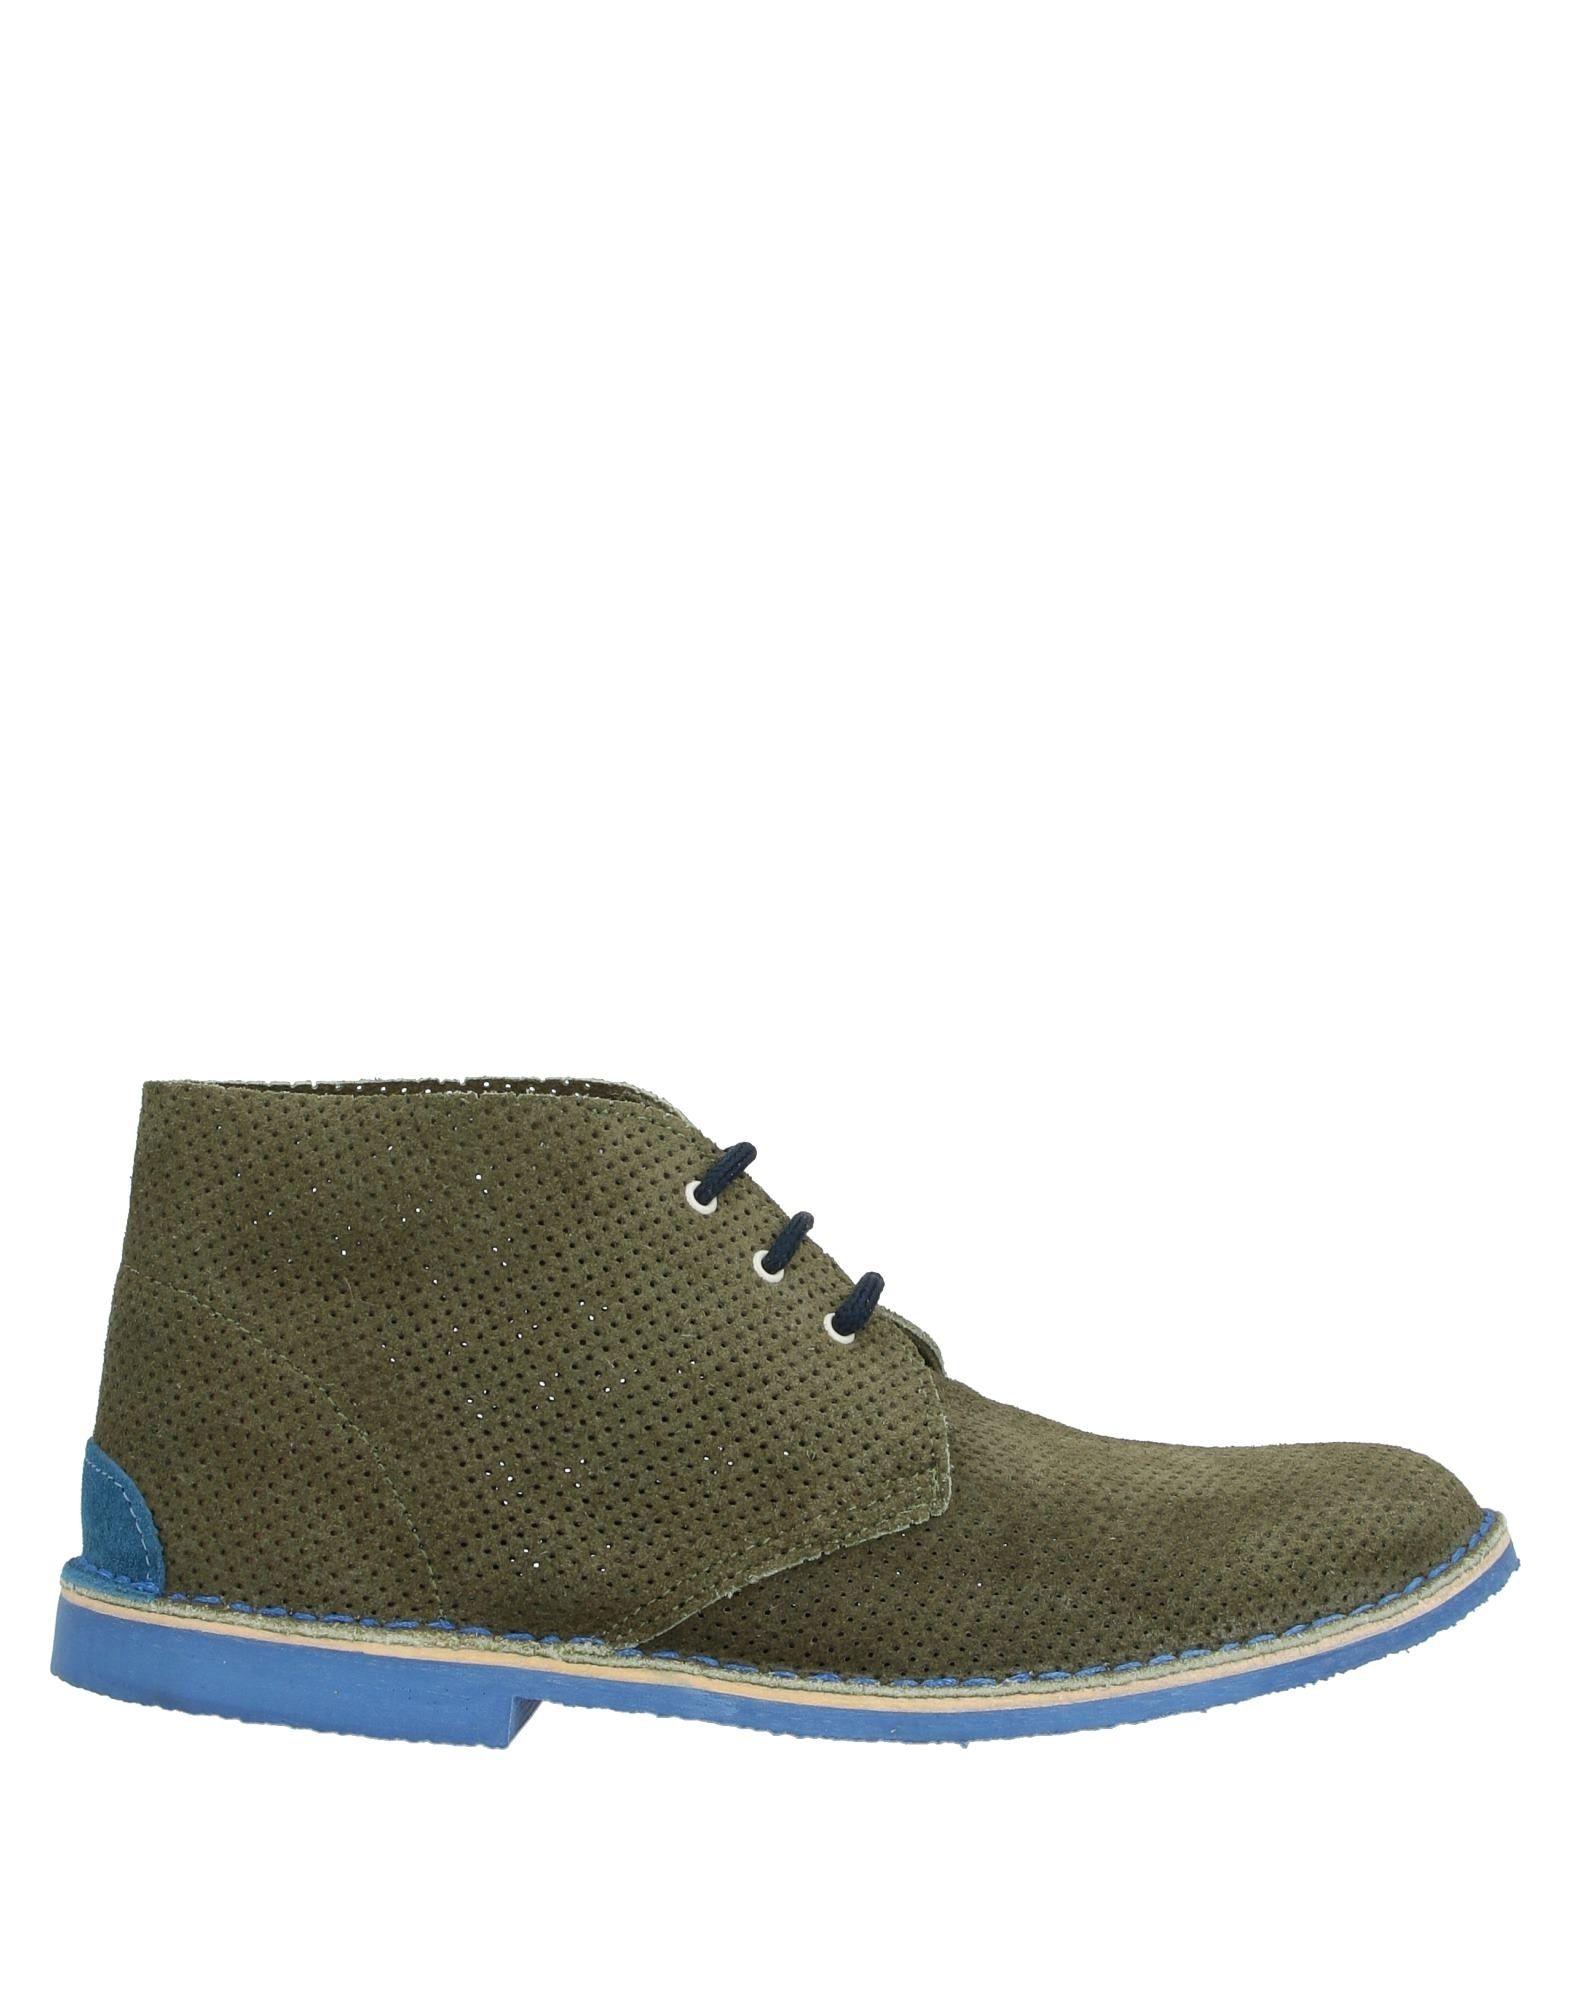 PAOLO DA PONTE Полусапоги и высокие ботинки 247 luxe ponte pant